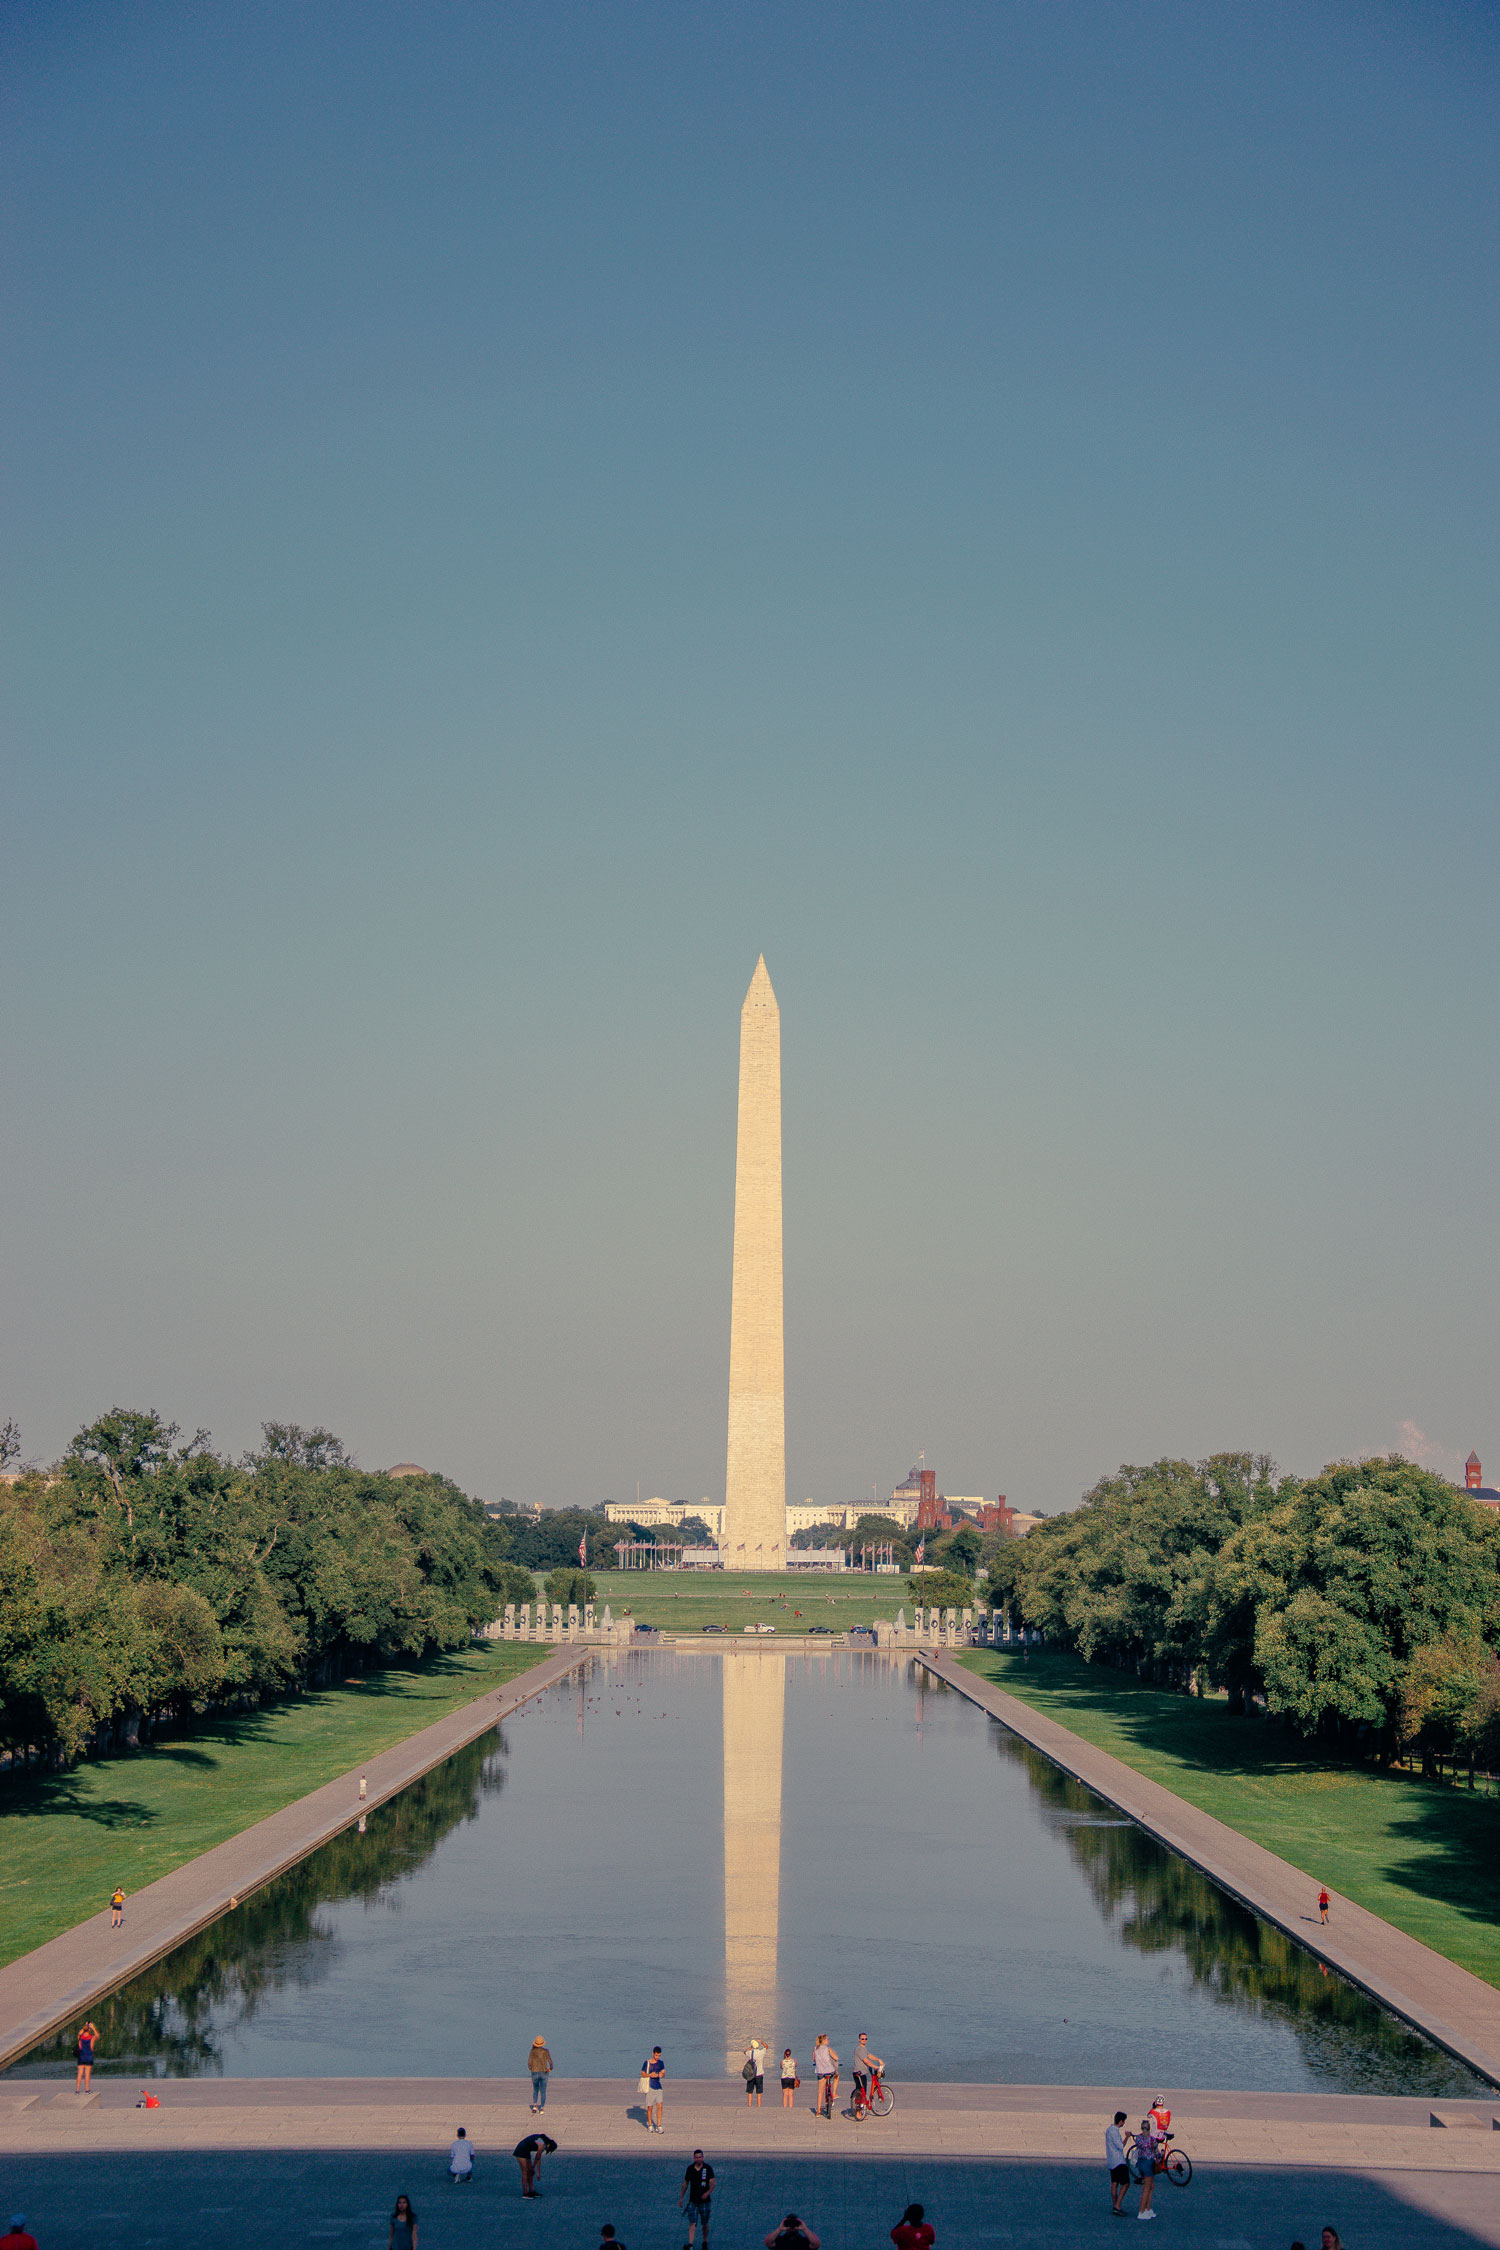 Washington_Monument_Washington_DC_2018_Ruo_Ling_Lu